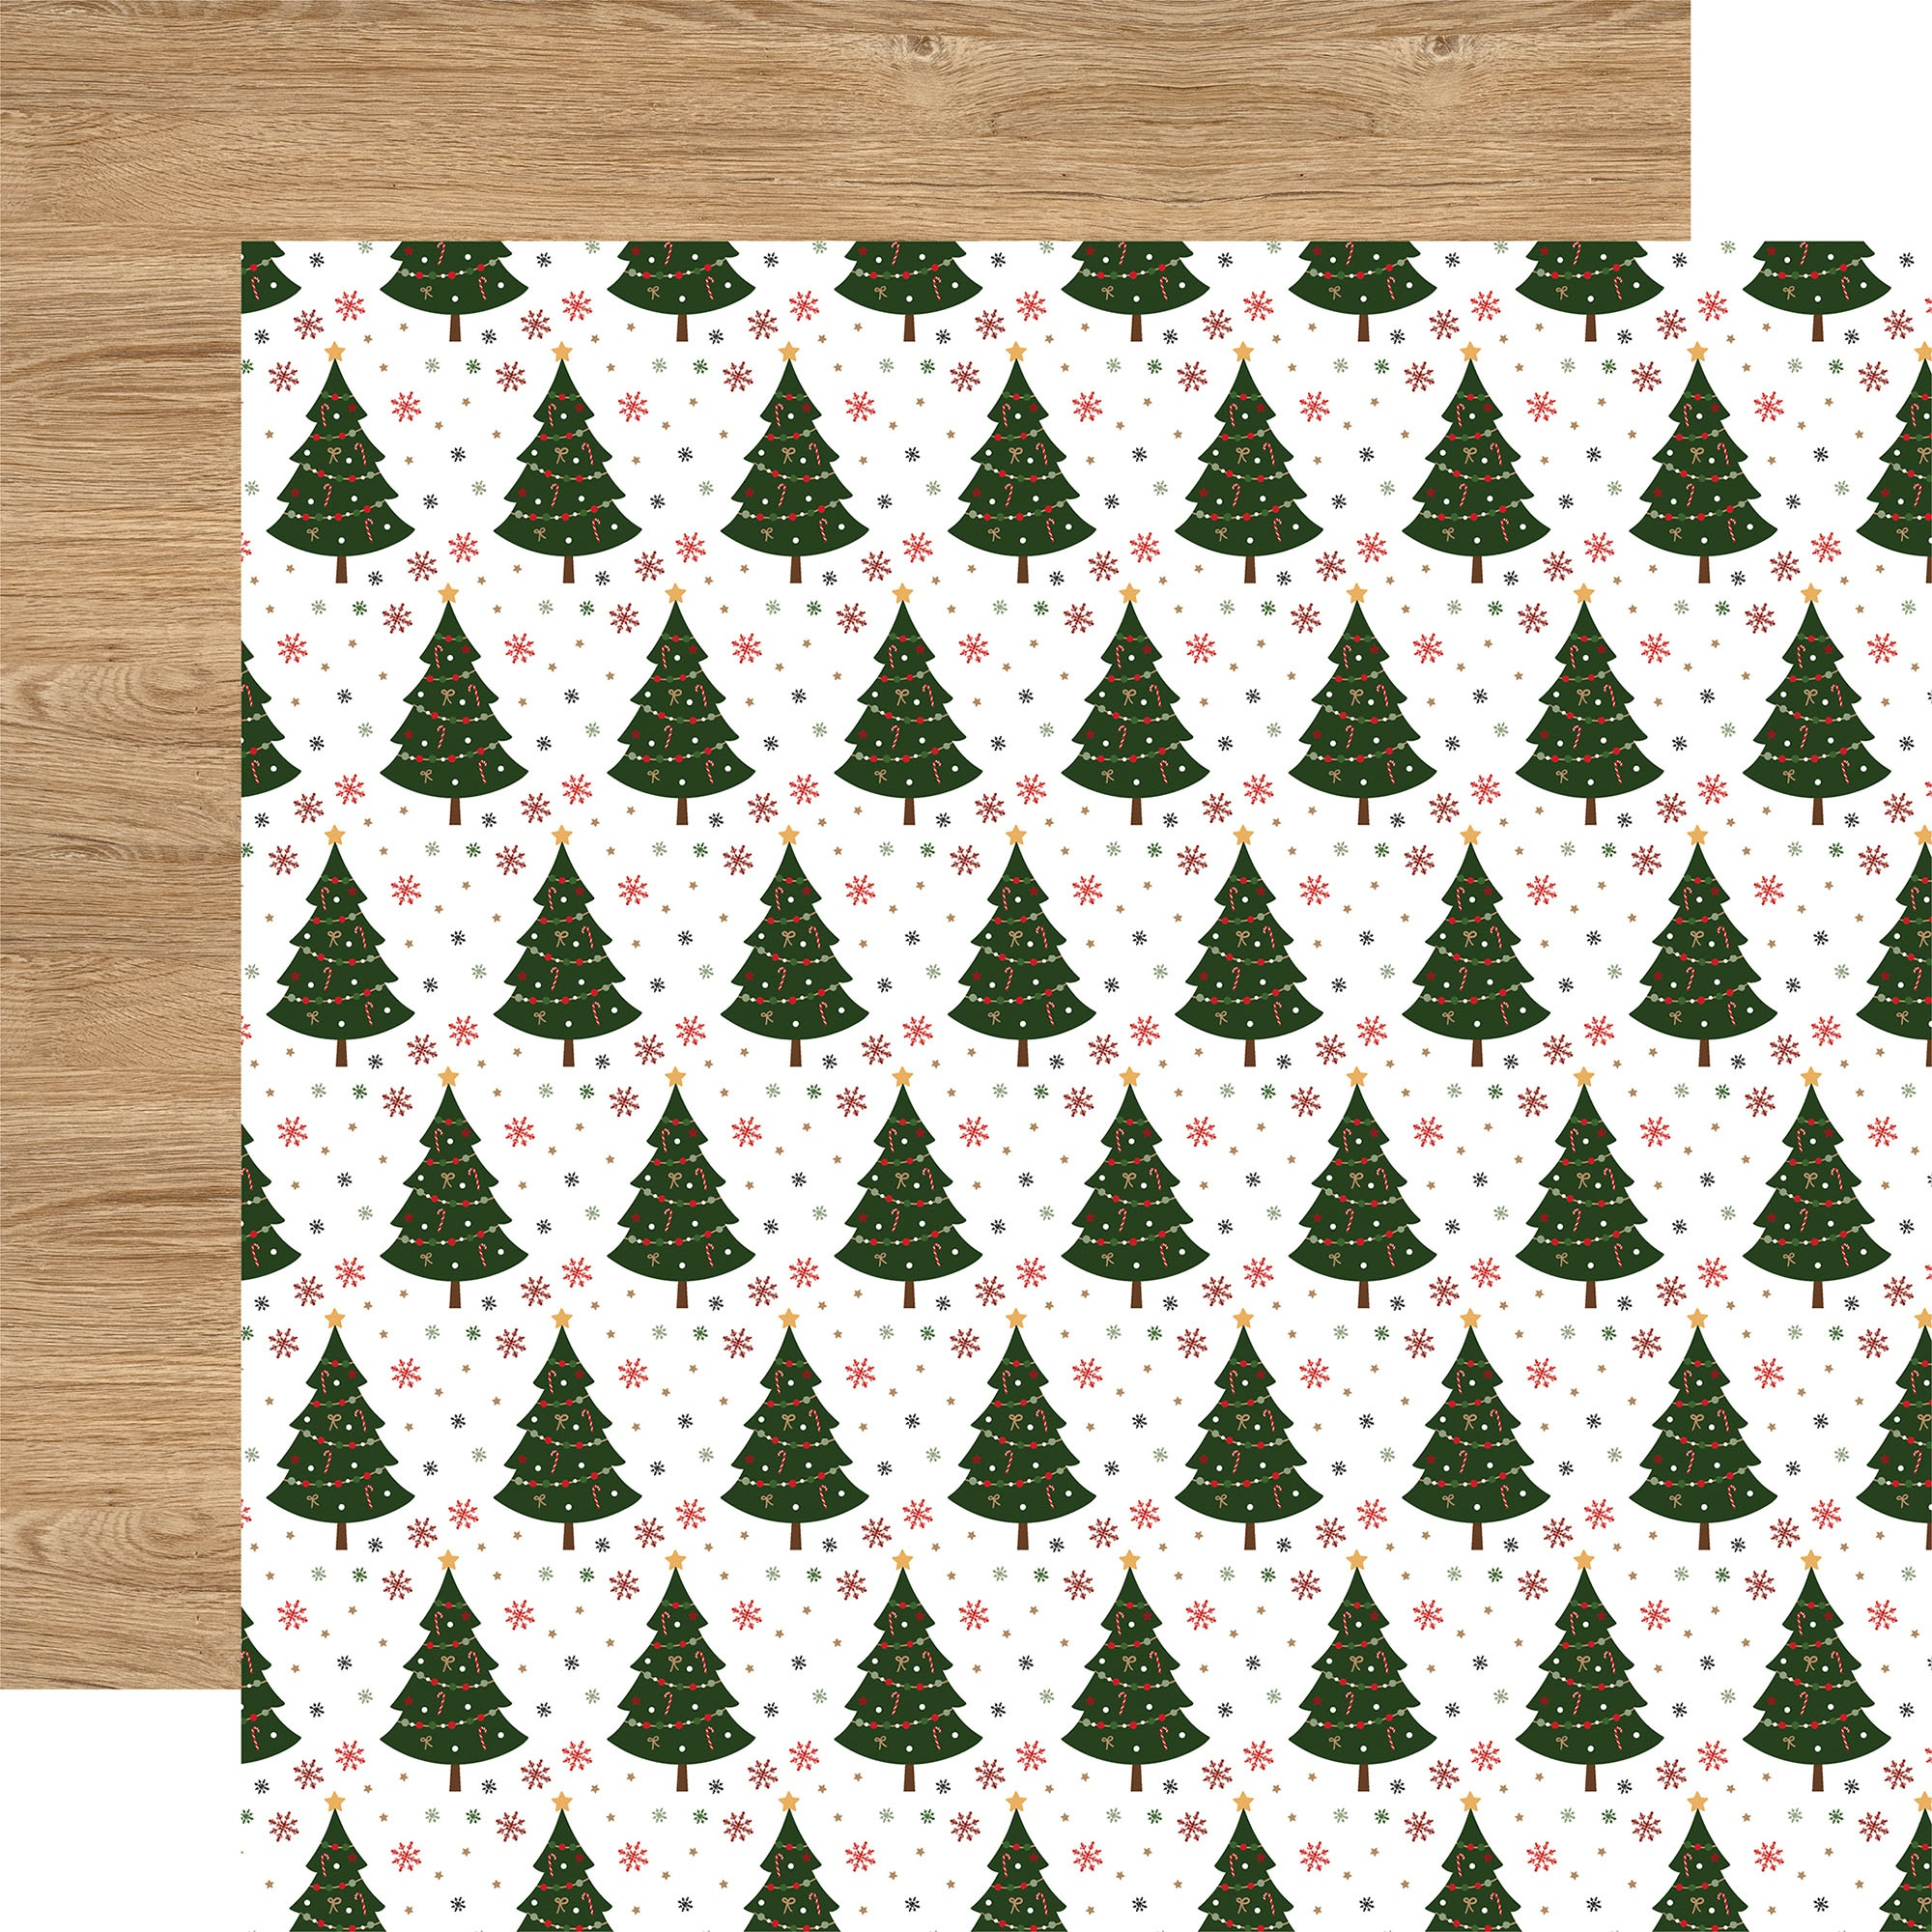 Echo Park - Jingle All The Way - O CHRISTMAS TREE - 12x12 Double-Sided Paper